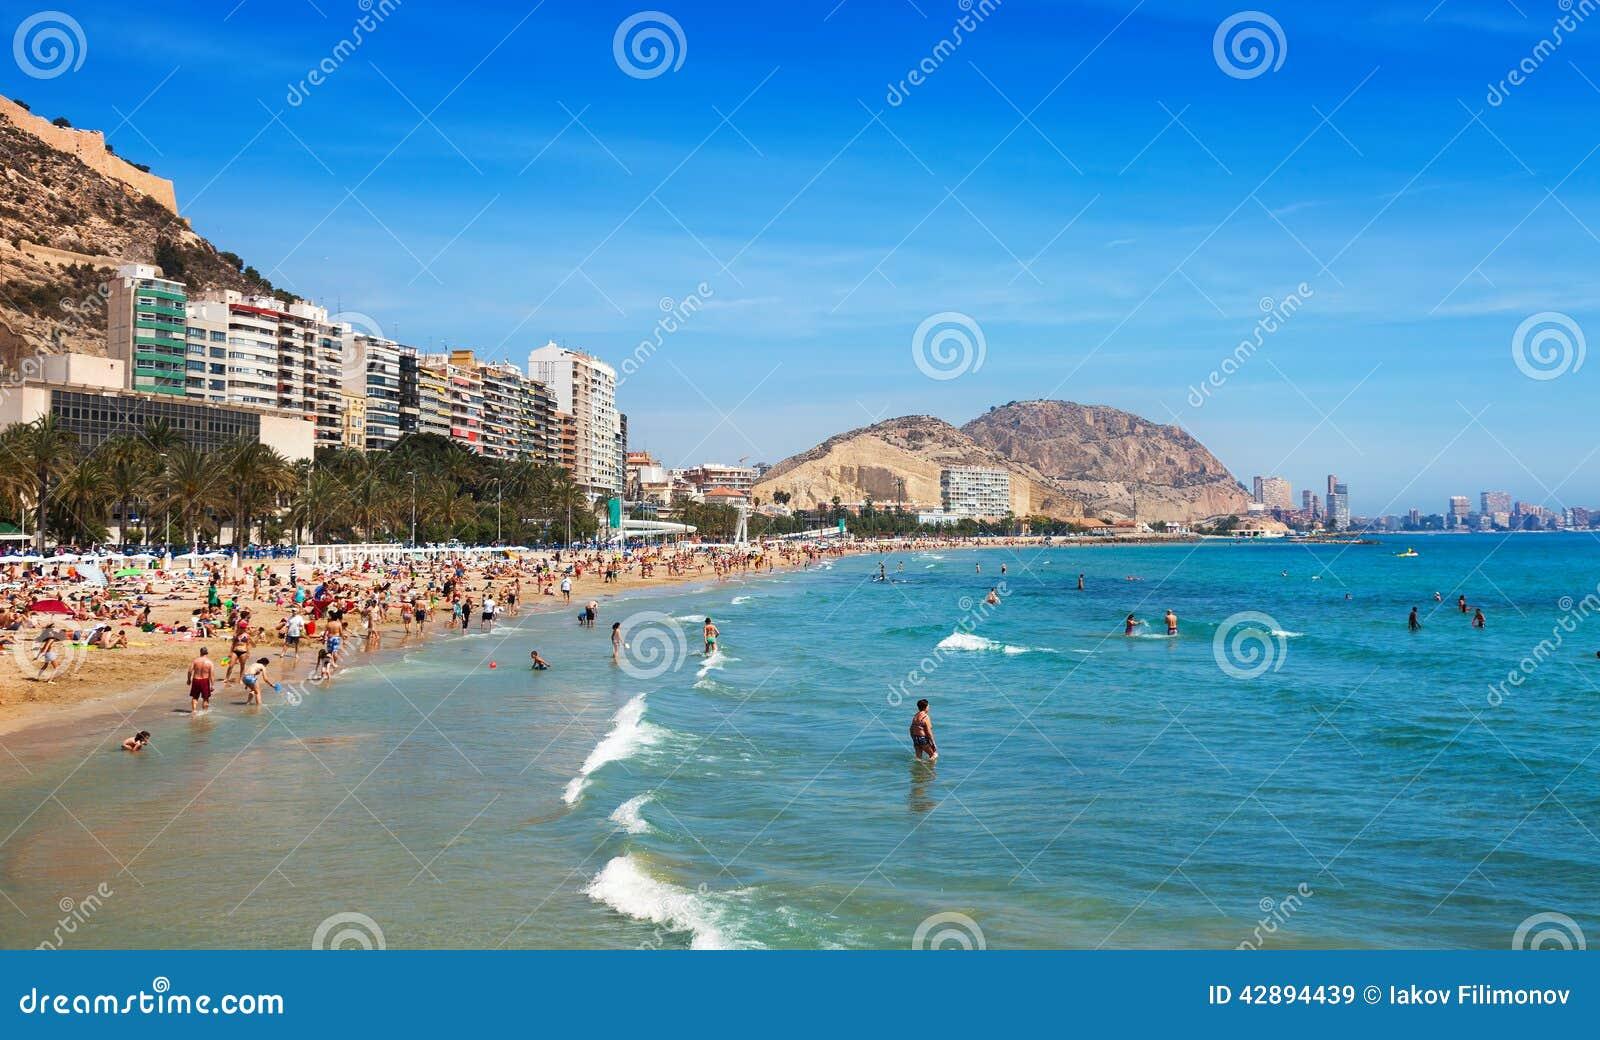 Mediterranean Beach In Alicante, Spain Editorial Stock ...